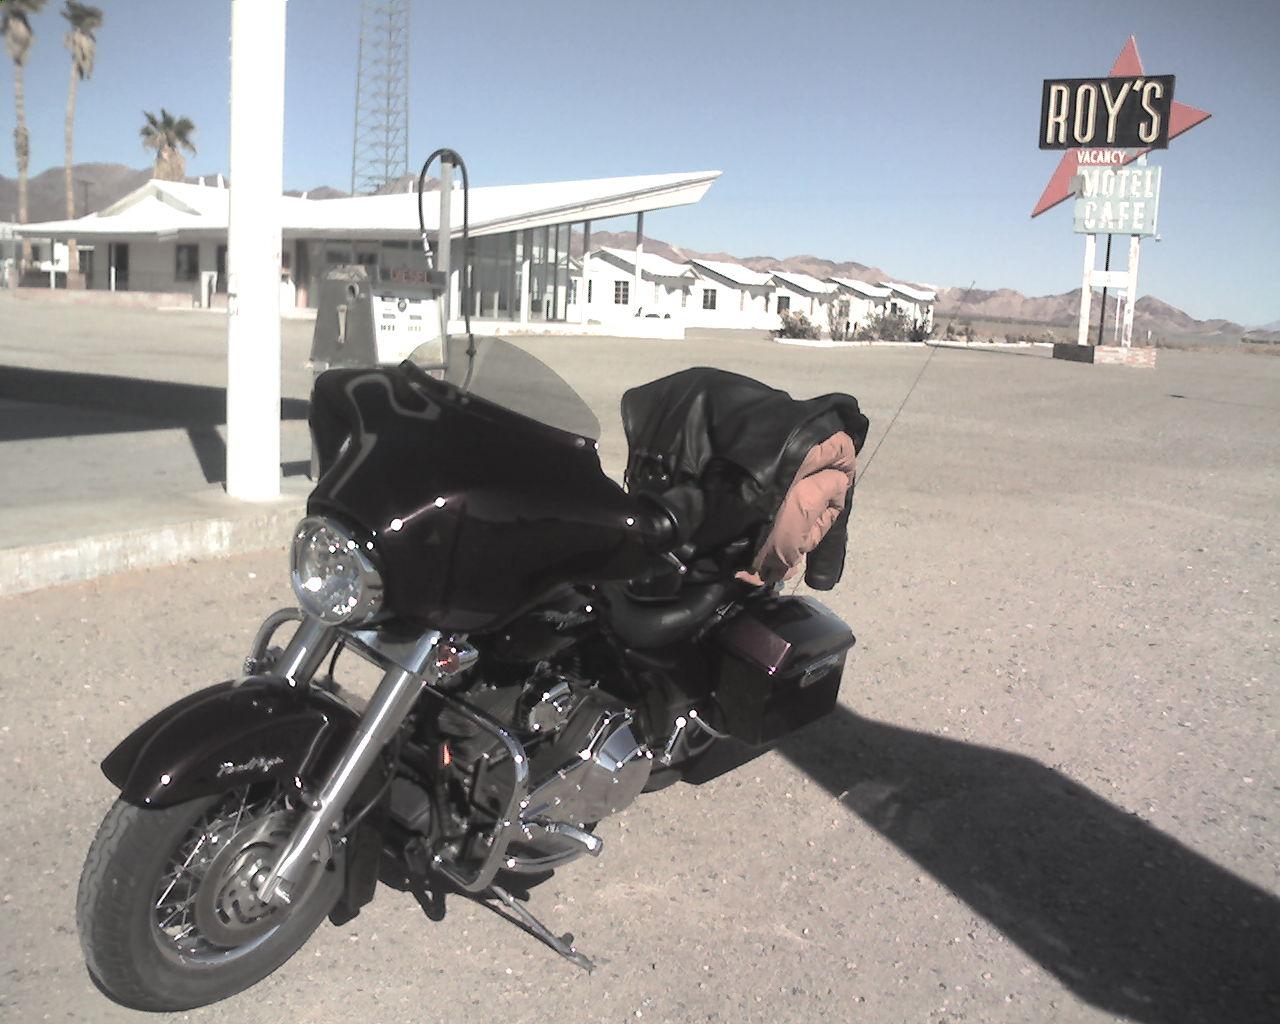 Harley Davidson, Meet Roys - Amboy Route 66